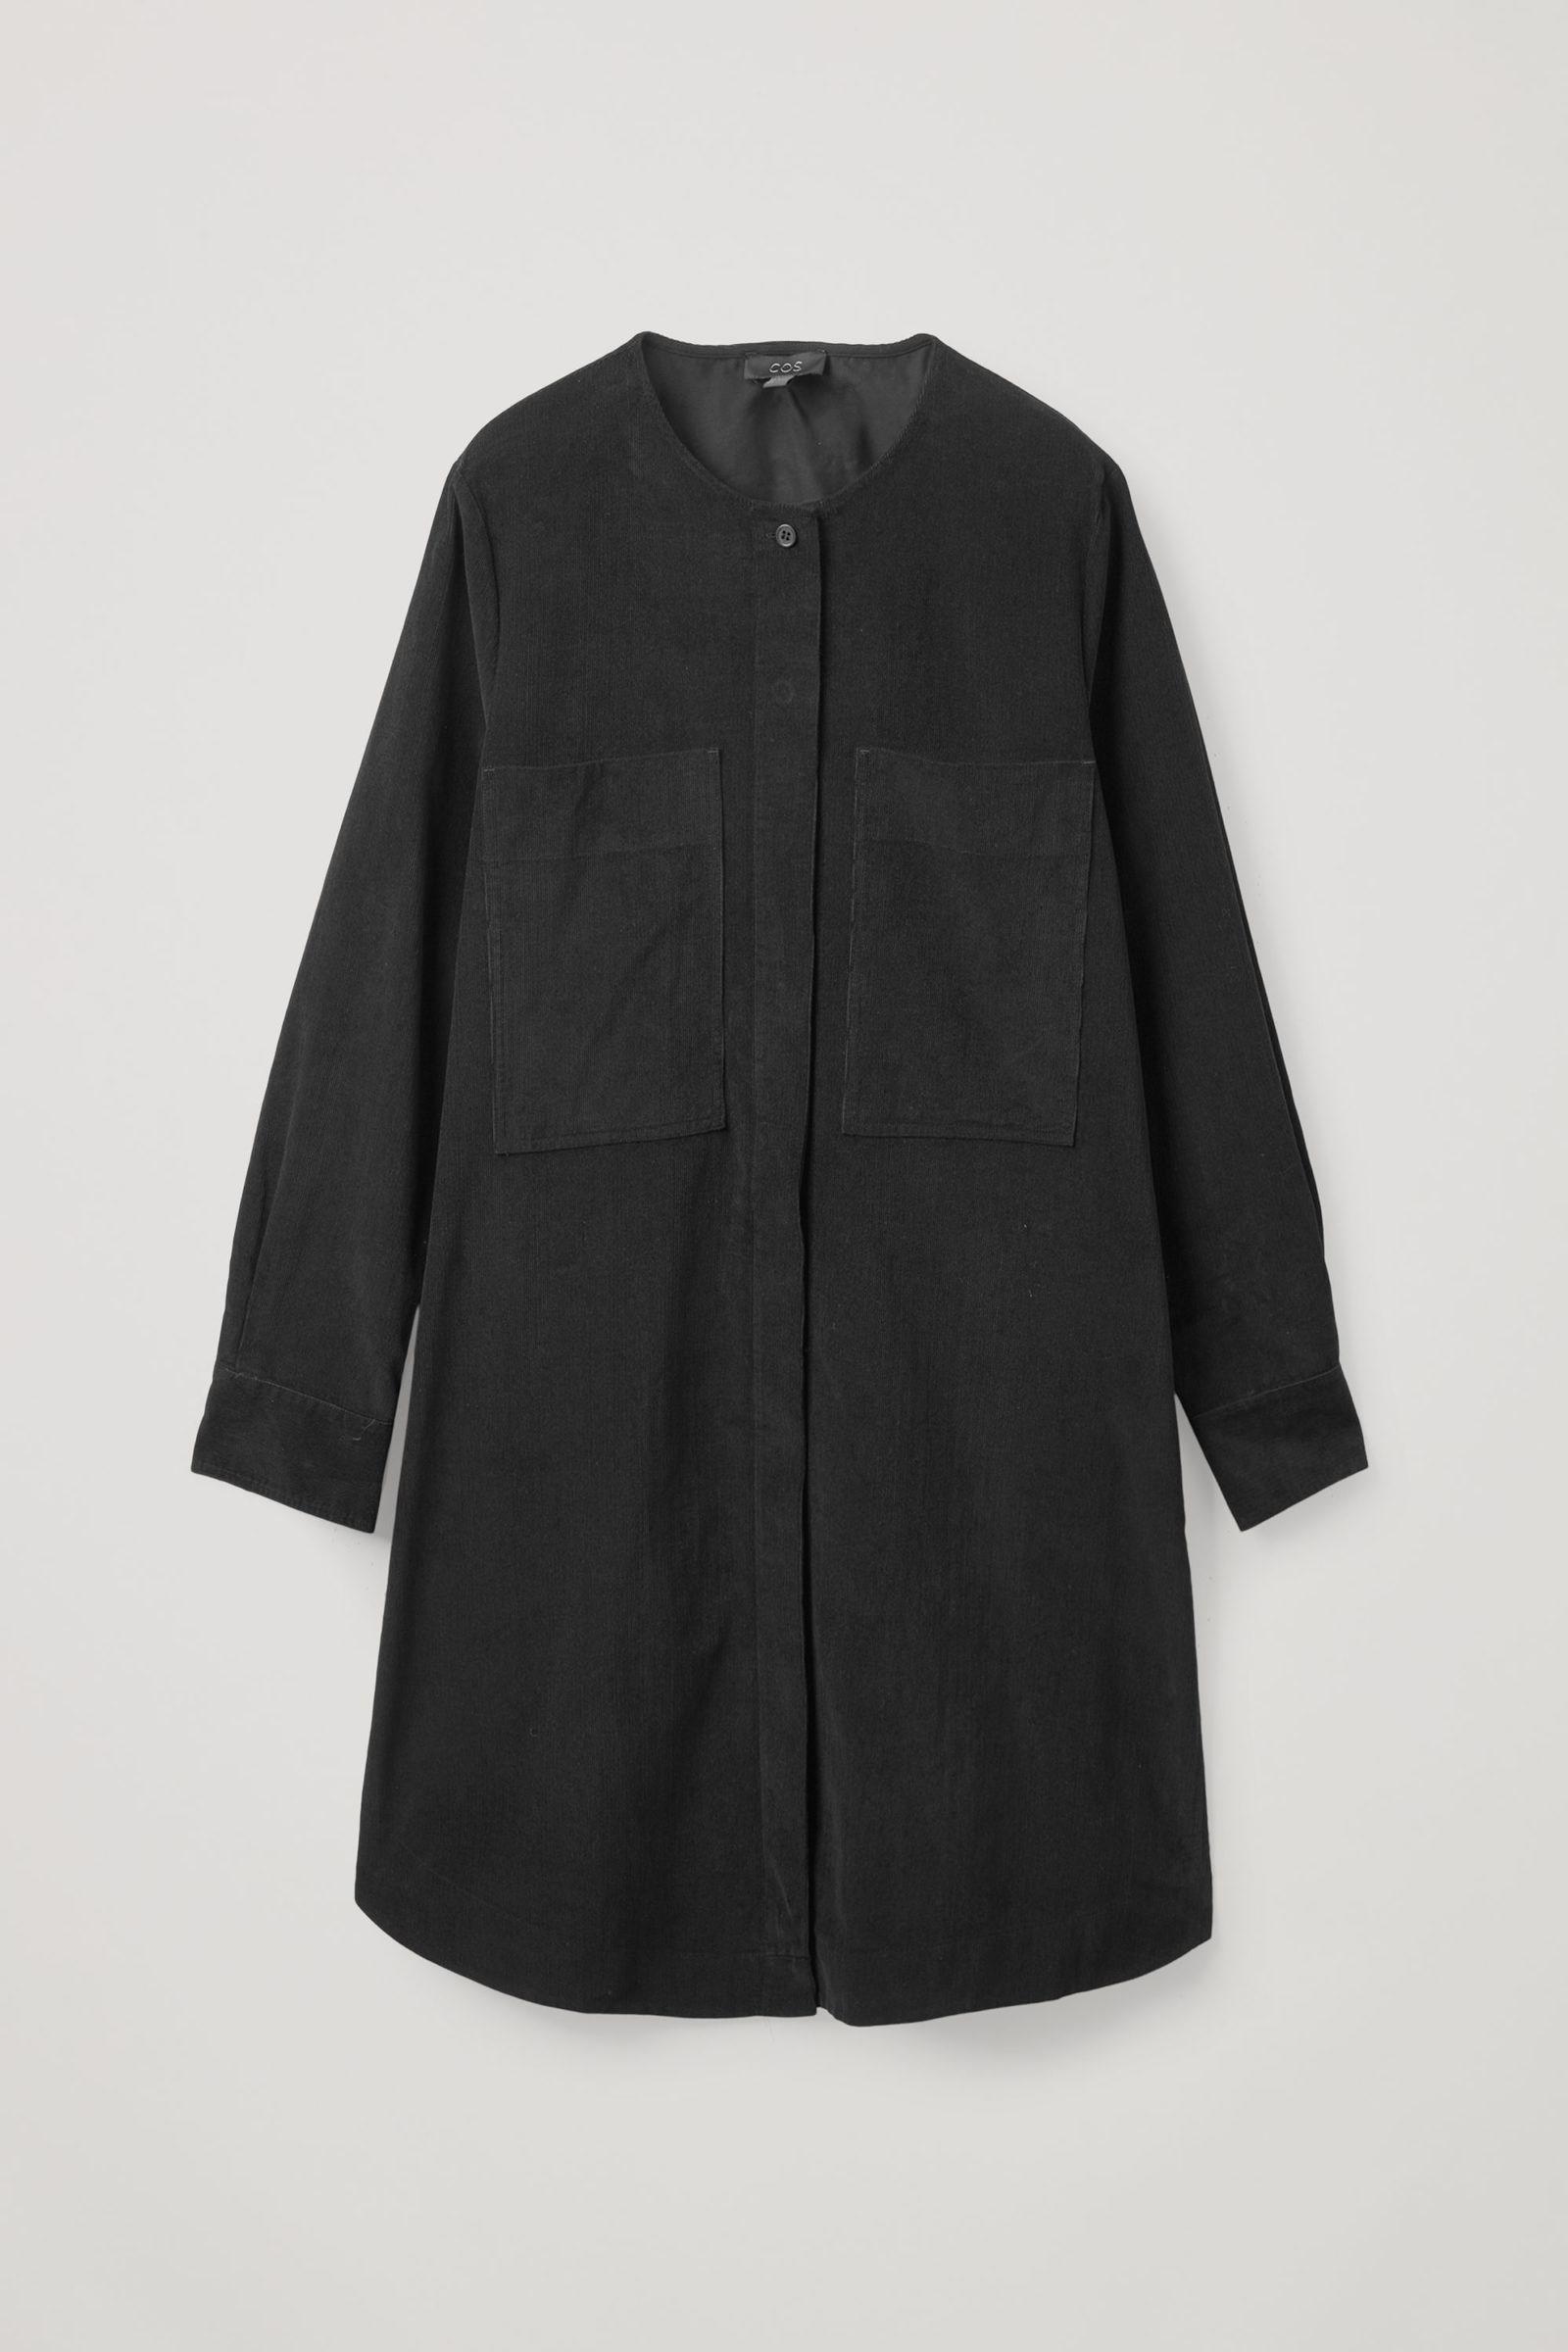 COS A라인 코튼 코듀로이 셔츠 드레스의 블랙컬러 Product입니다.